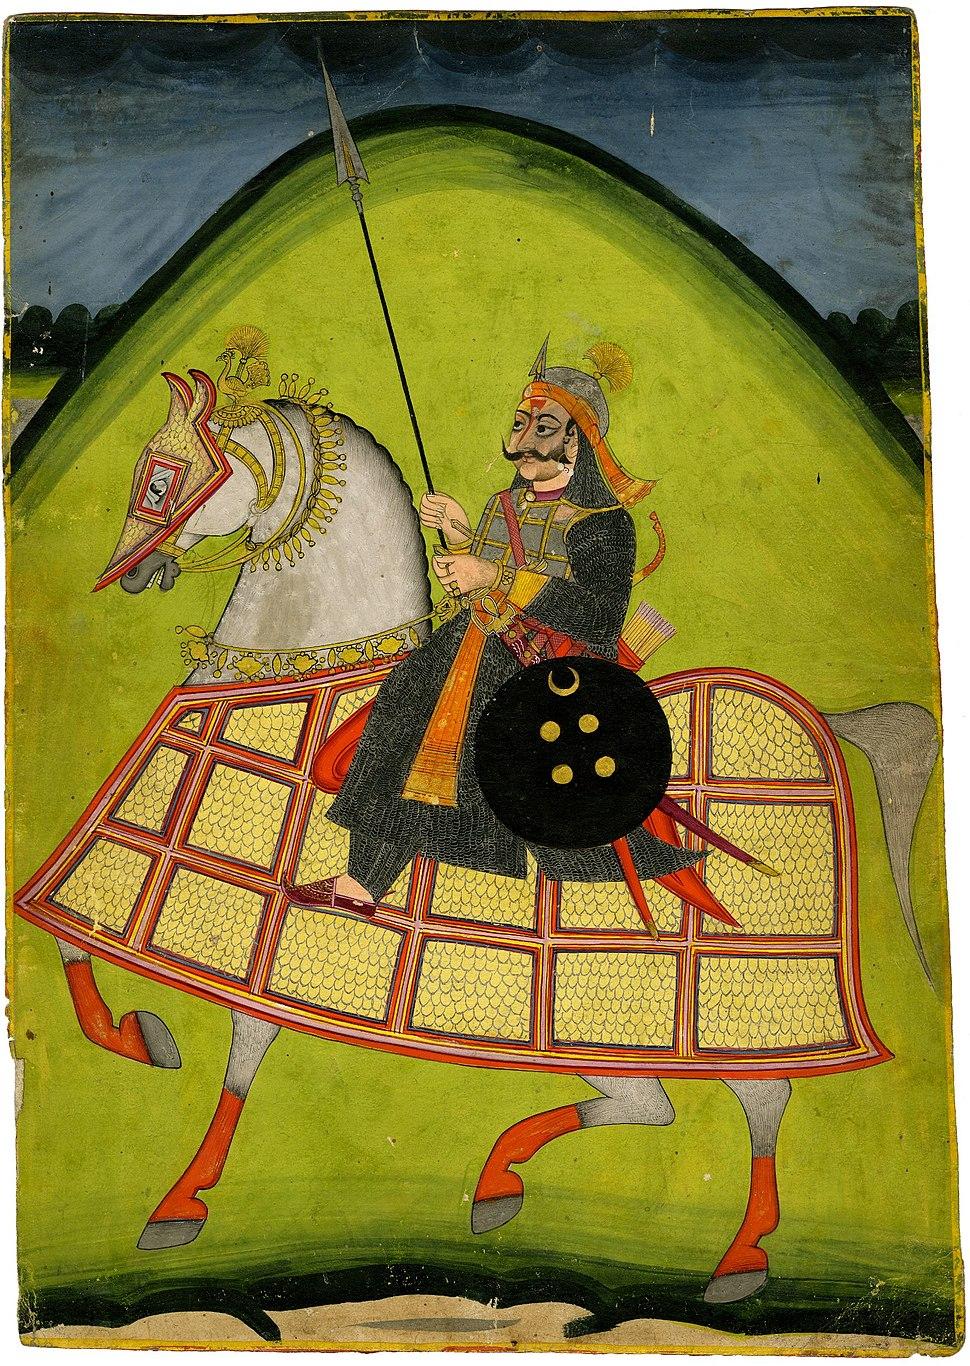 Rajput warrior on horseback, with caption in Kayathi and Nagari.